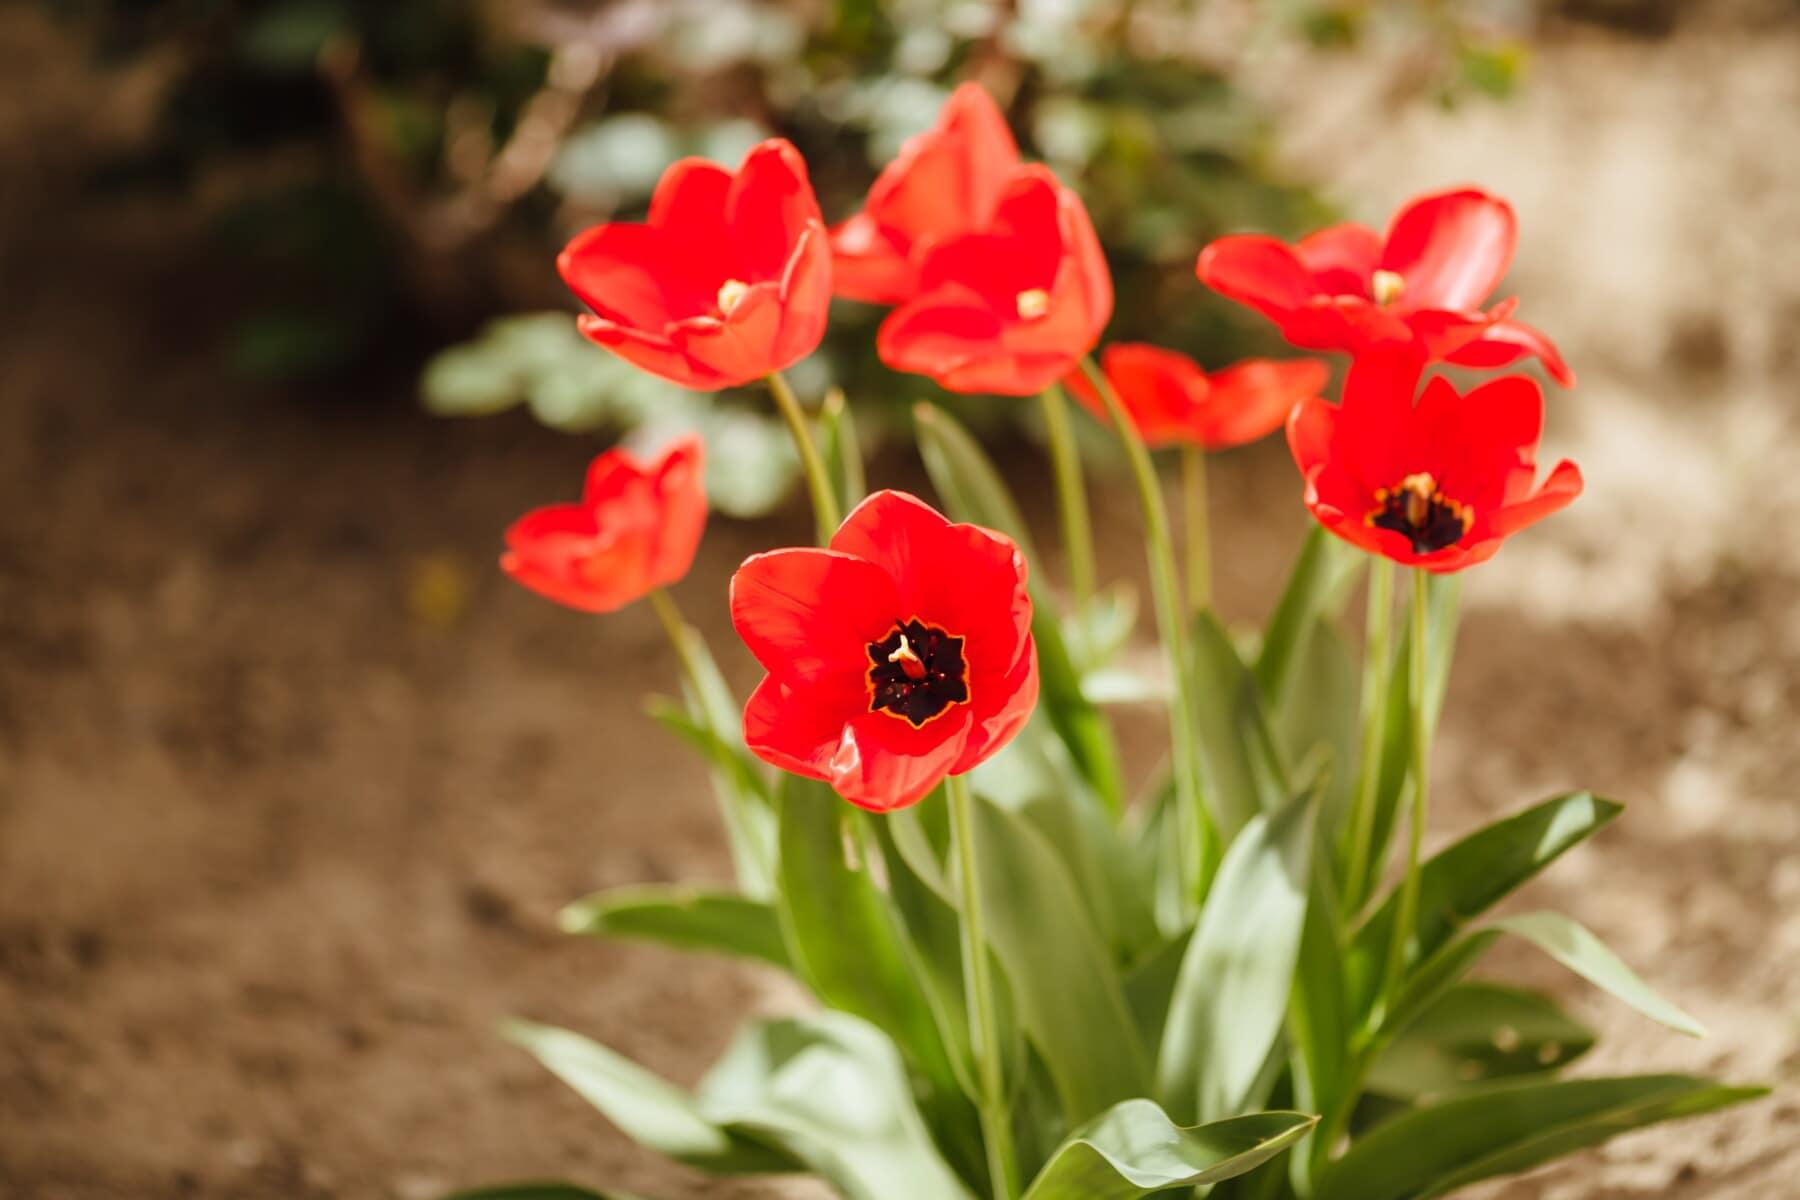 red, tulips, flower garden, flora, leaf, tulip, blossom, plant, nature, flower